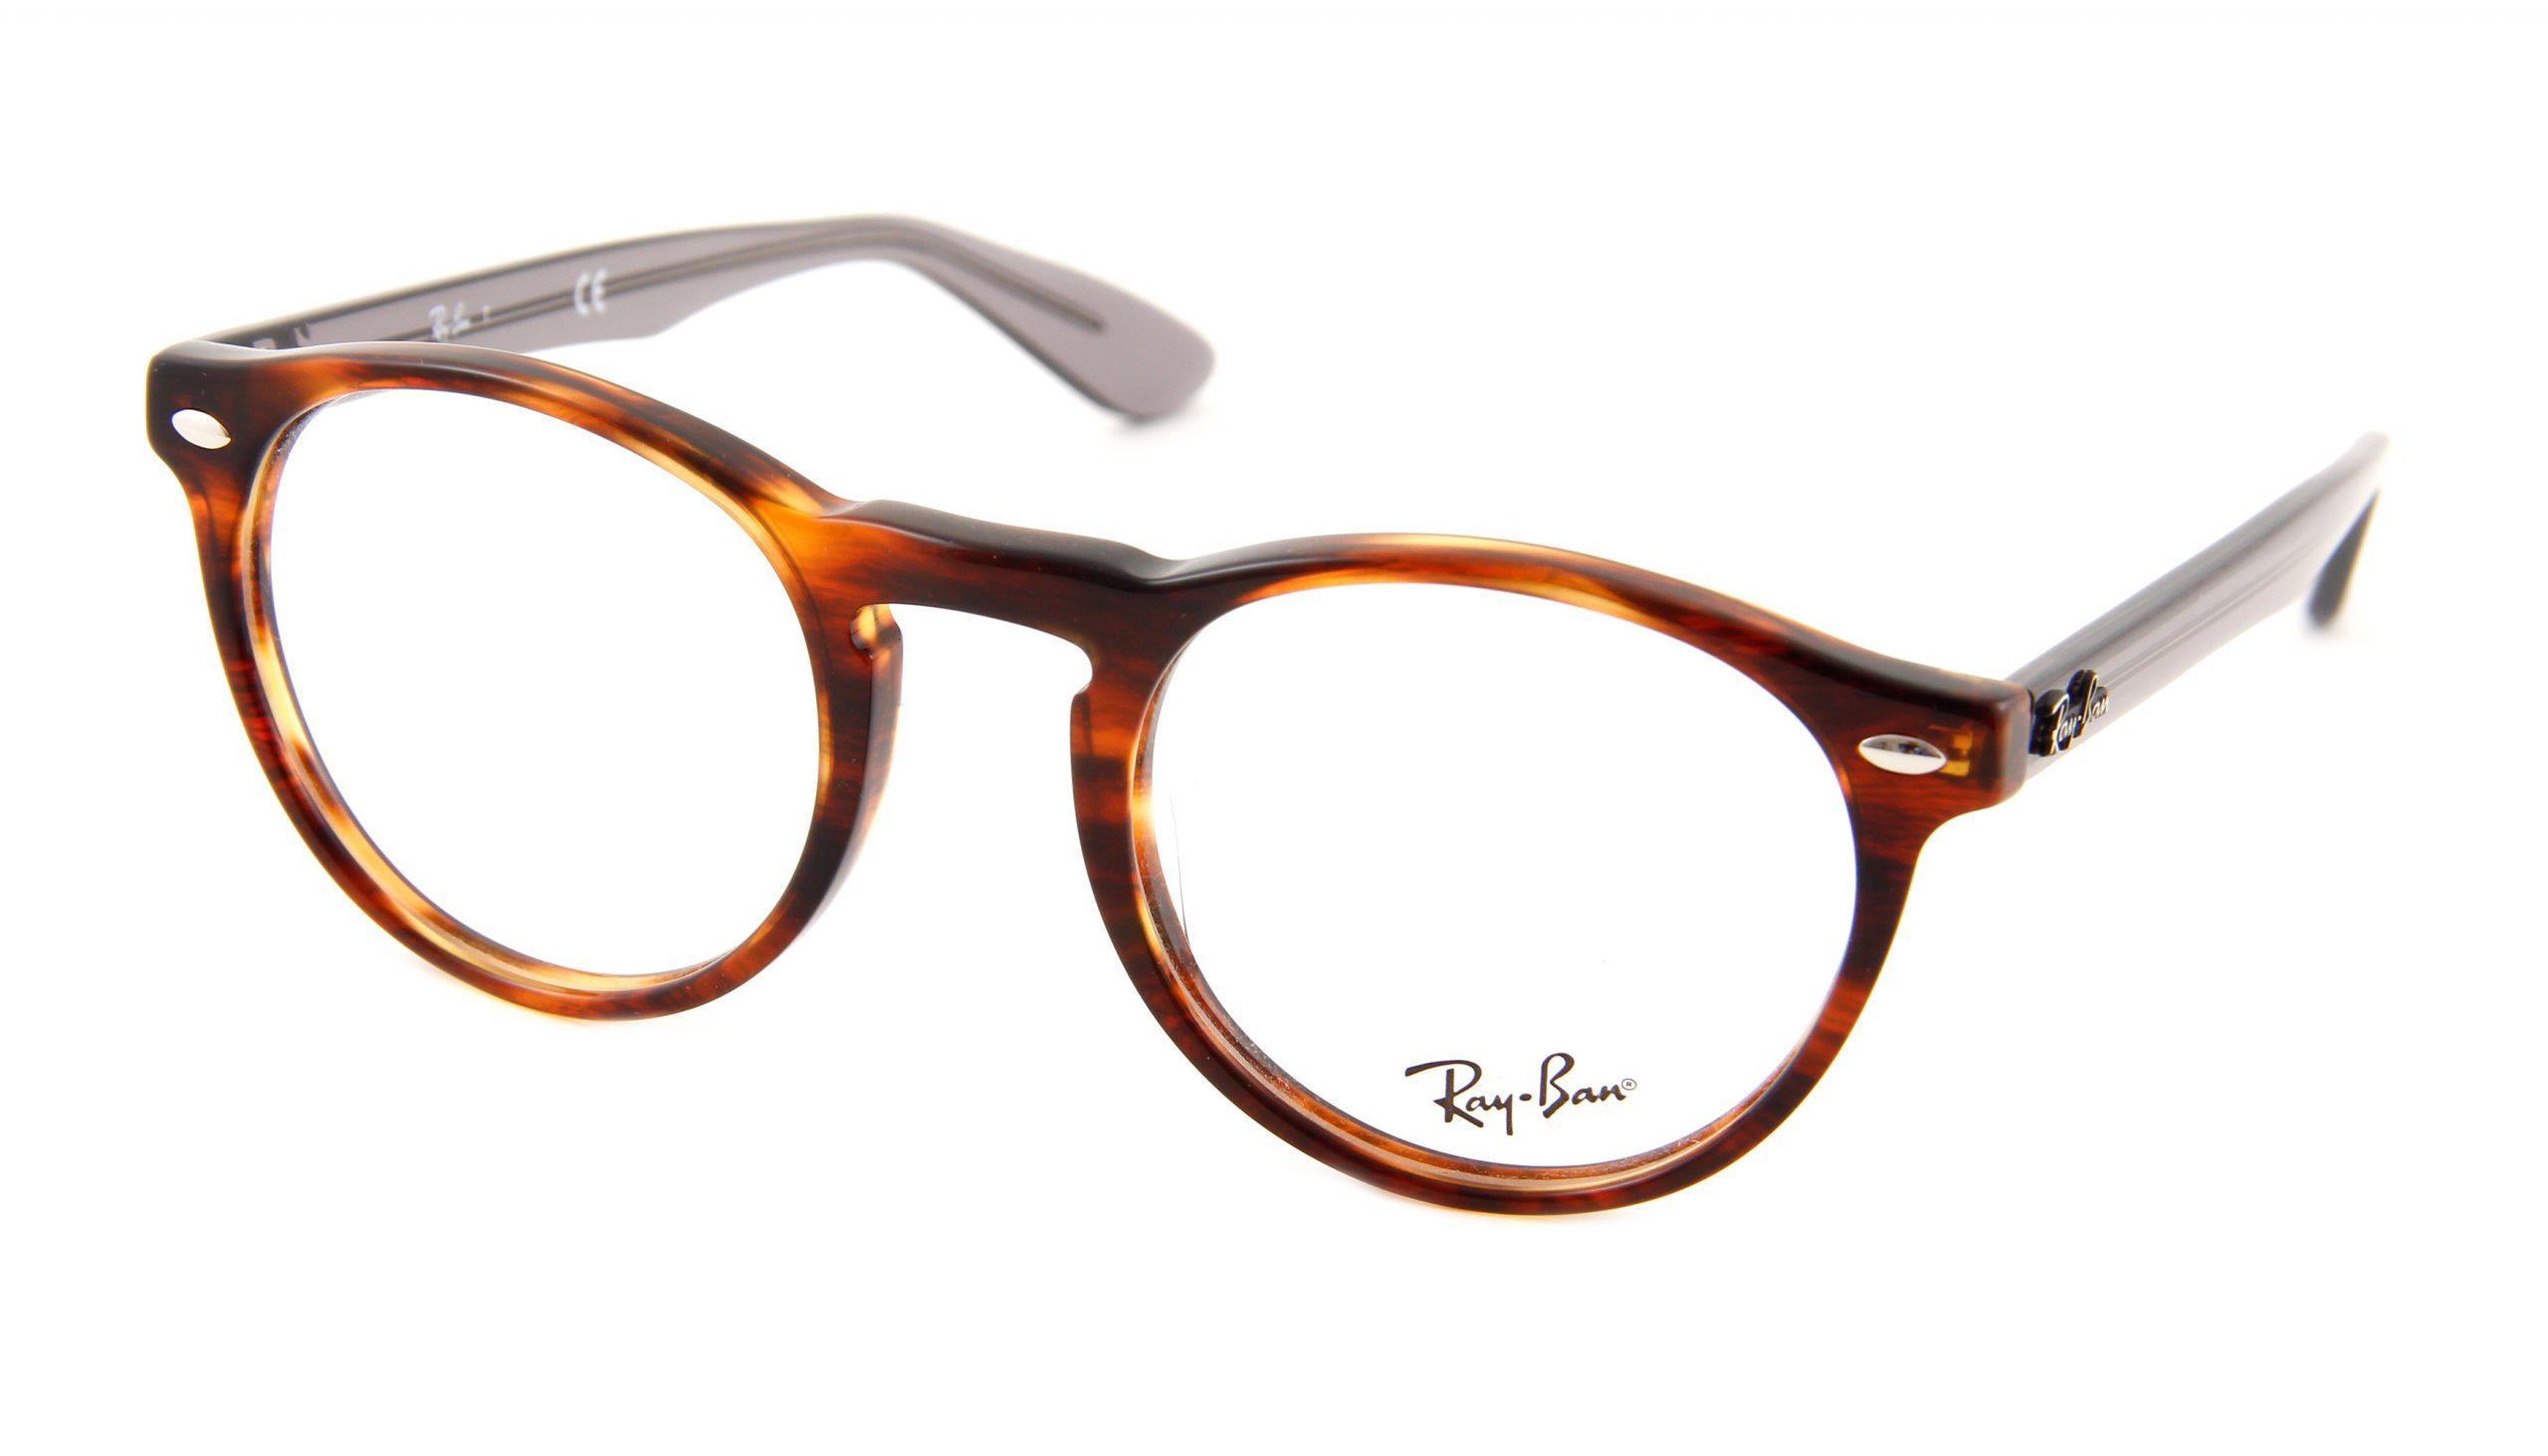 Leesbril Ray-Ban RB5283-5607-49 havanna